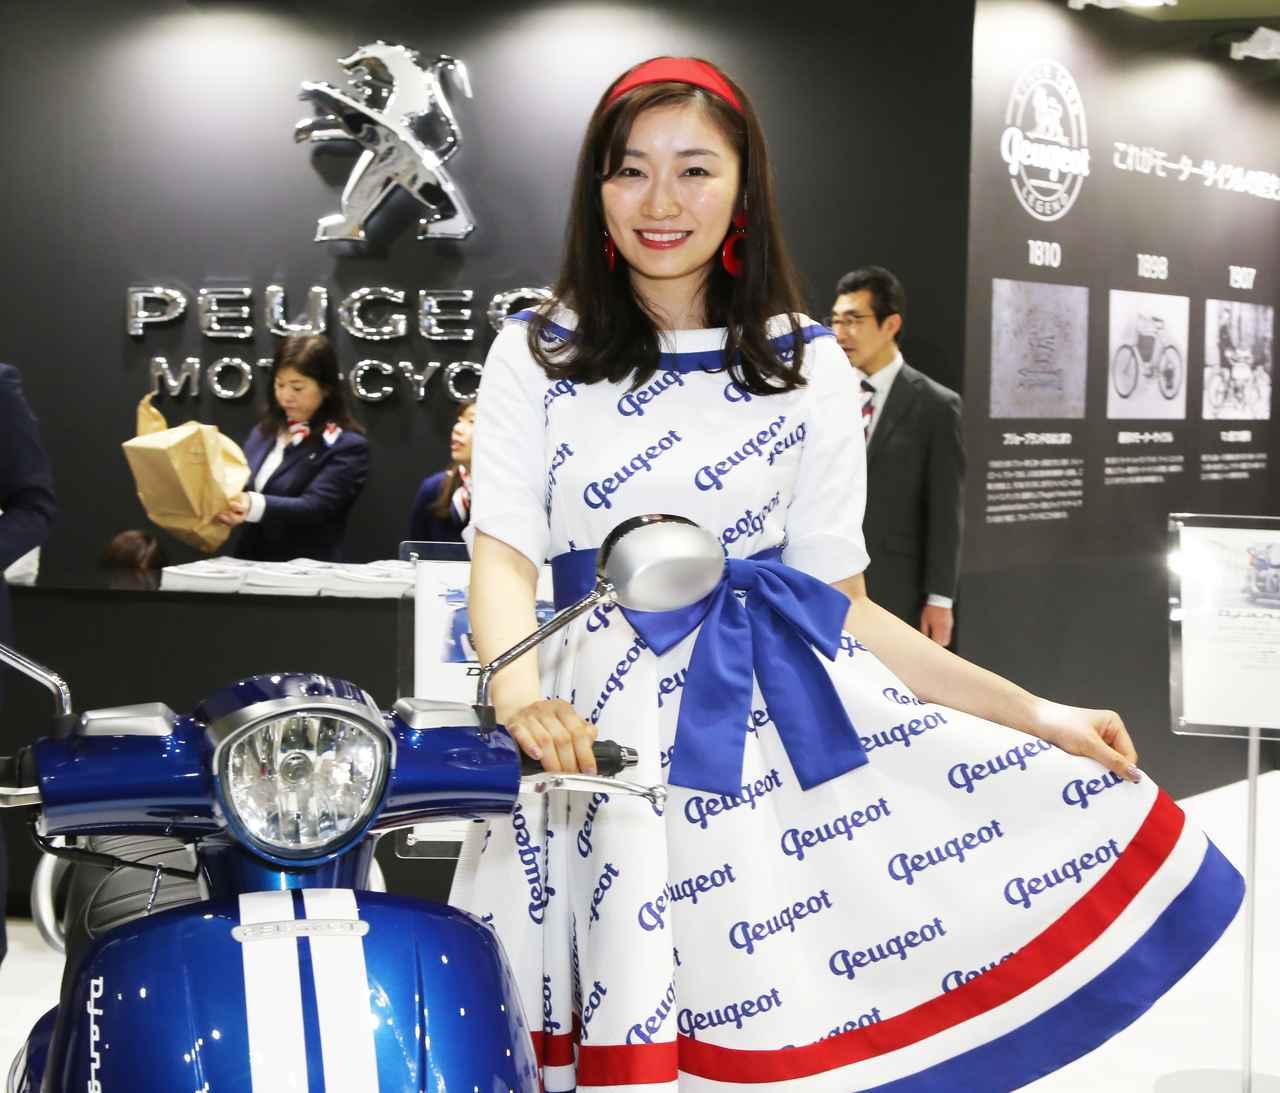 Images : 17番目の画像 - TMCS2019 美女コンパニオン図鑑! - webオートバイ